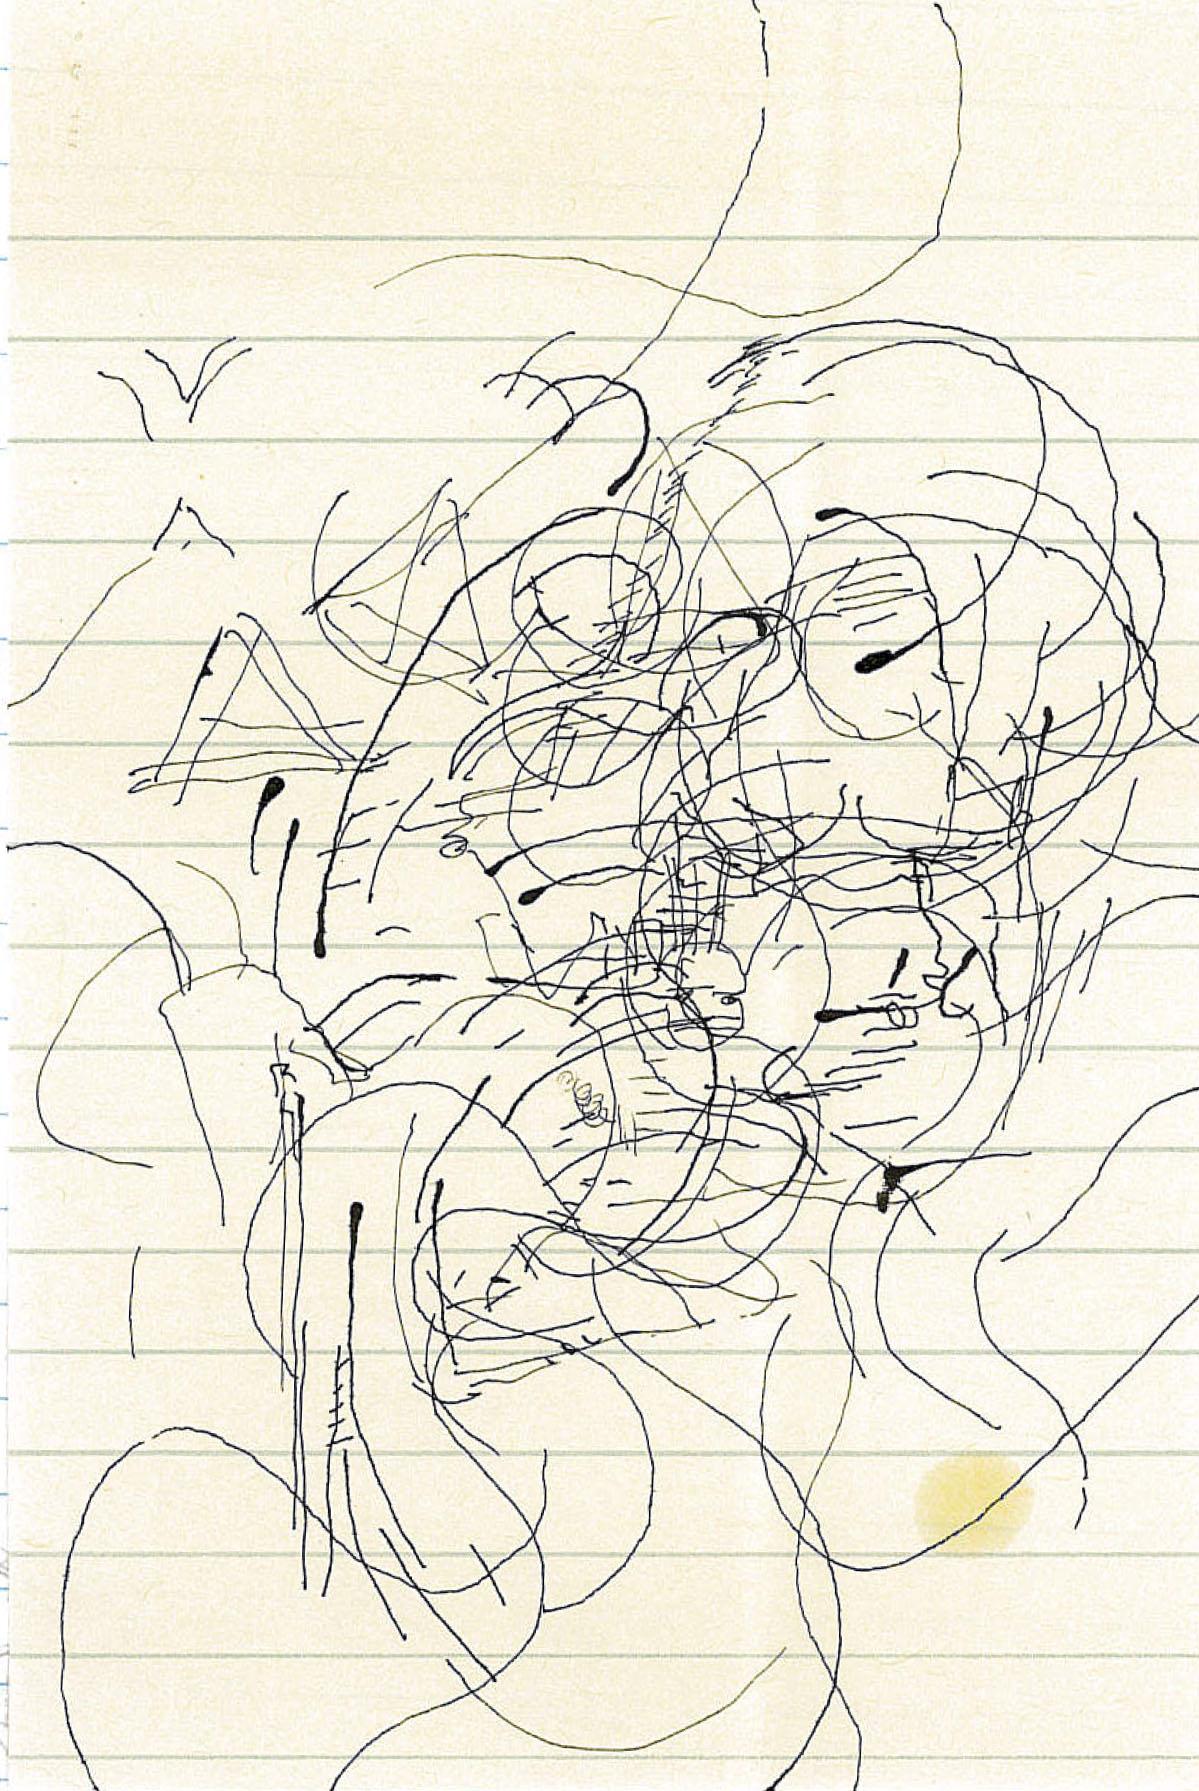 Automatic Drawing : automatic, drawing, Automatic, Office, Surrealist, Investigations